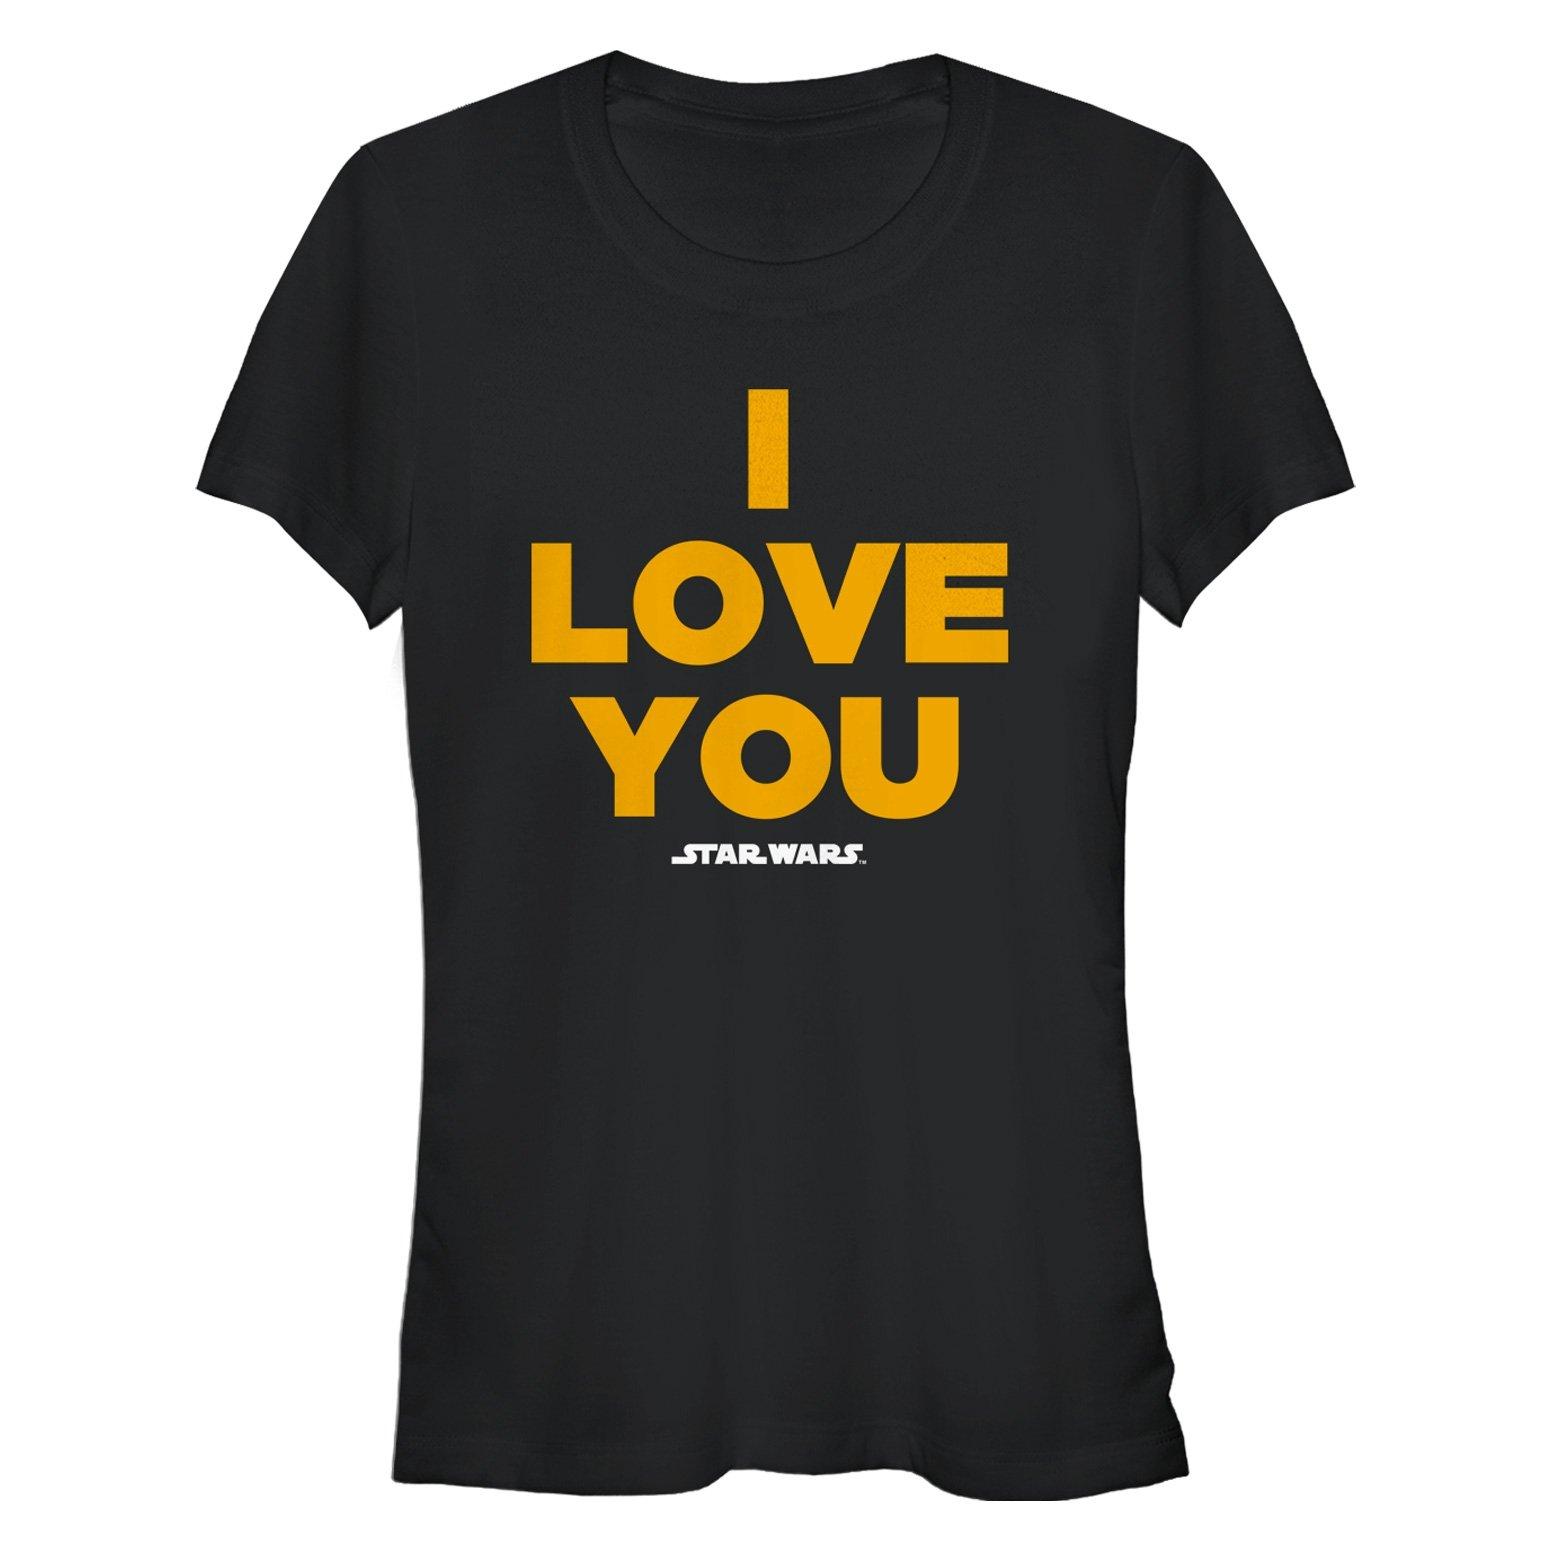 Star Wars Women's I Love You Crew Neck Graphic T-Shirt, Black, XXL